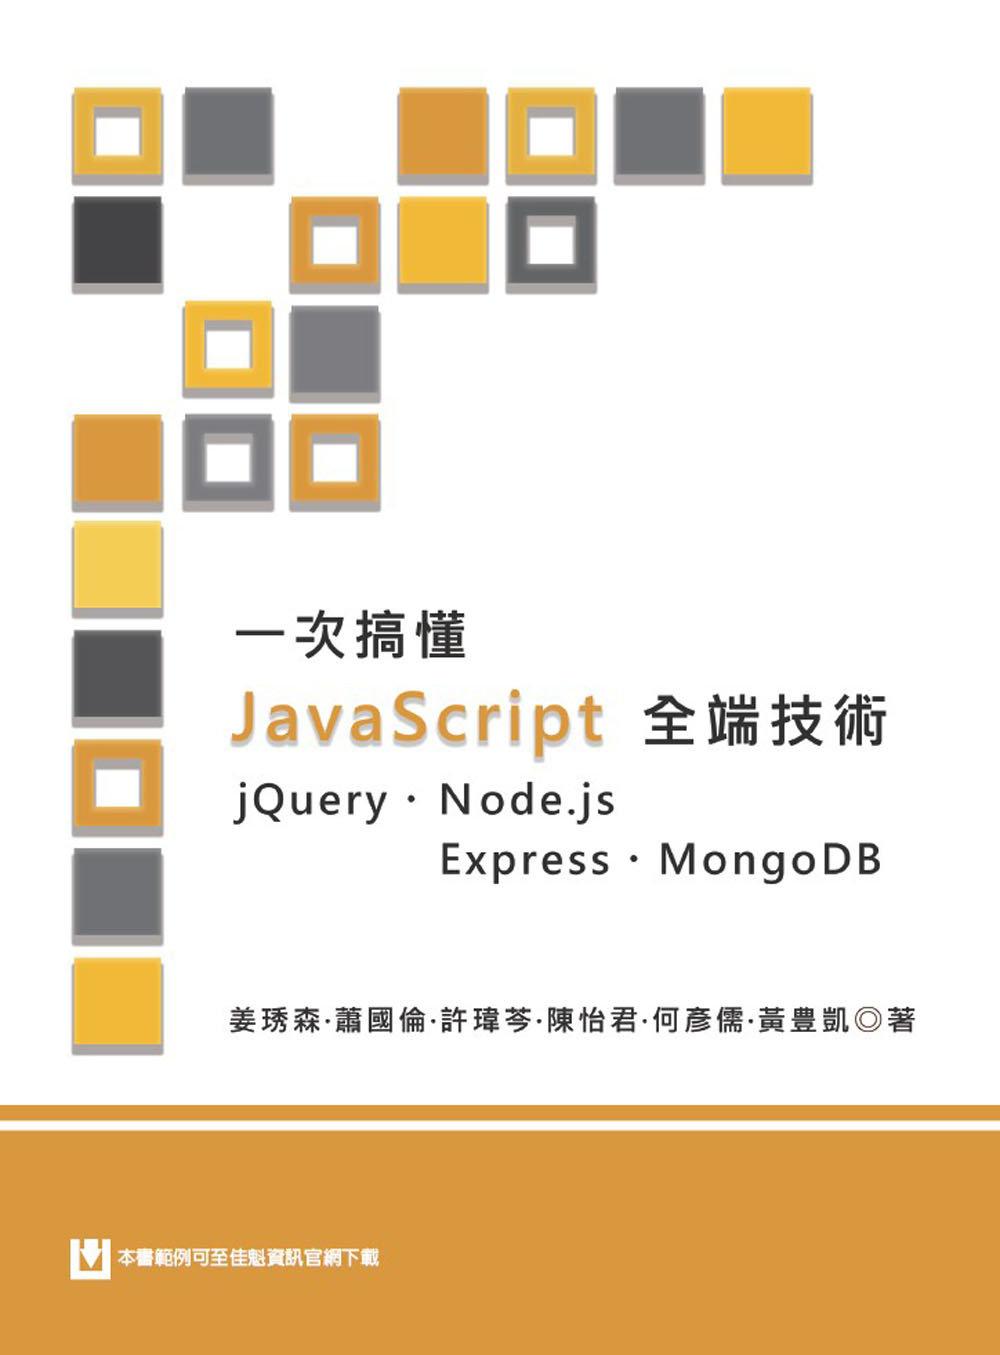 一次搞懂 JavaScript 全端技術 jQuery、Node.js、Express、MongoDB-preview-1